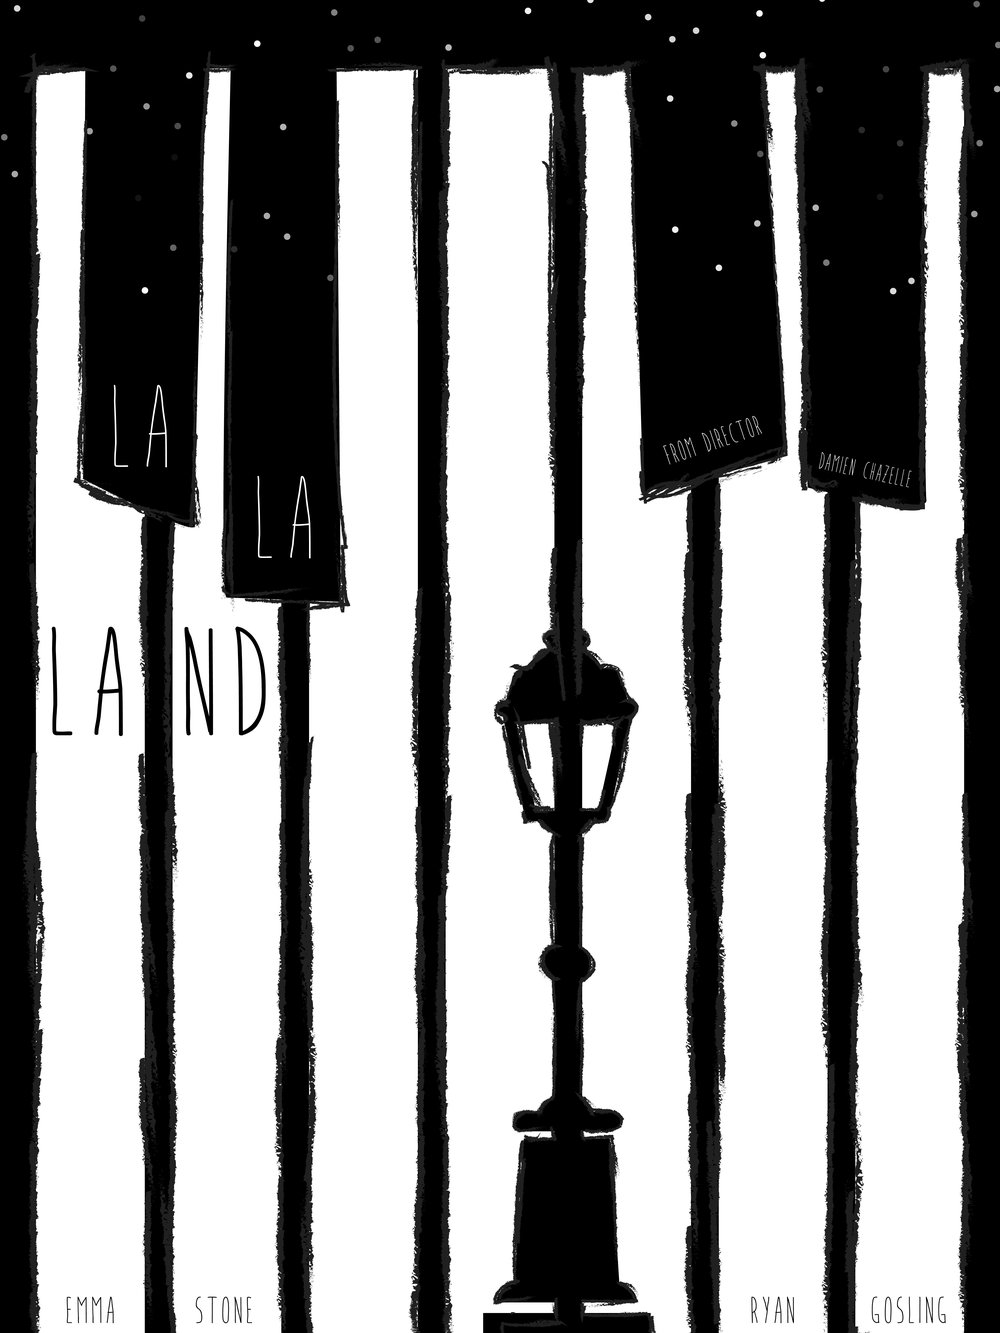 movie posters_LALA2-03 copy.jpg